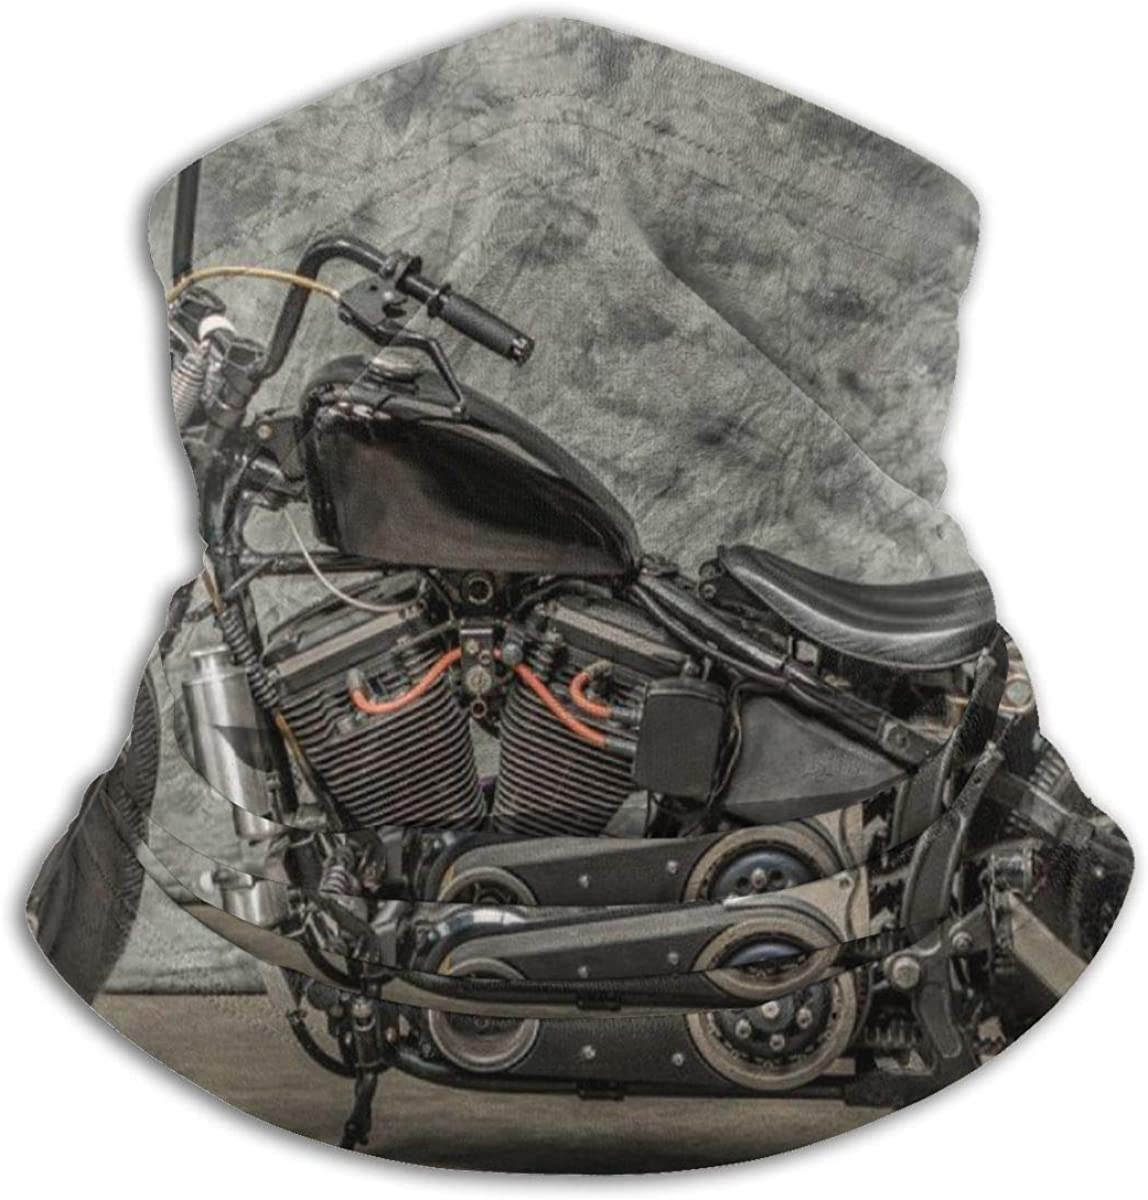 Harley Davidson Motorcycle Neck Warmer Gaiter For Men Women Headband Face Mask Bandana Head Wrap Scarf Headwear Winter Balaclava For Ski Running Motorcycle